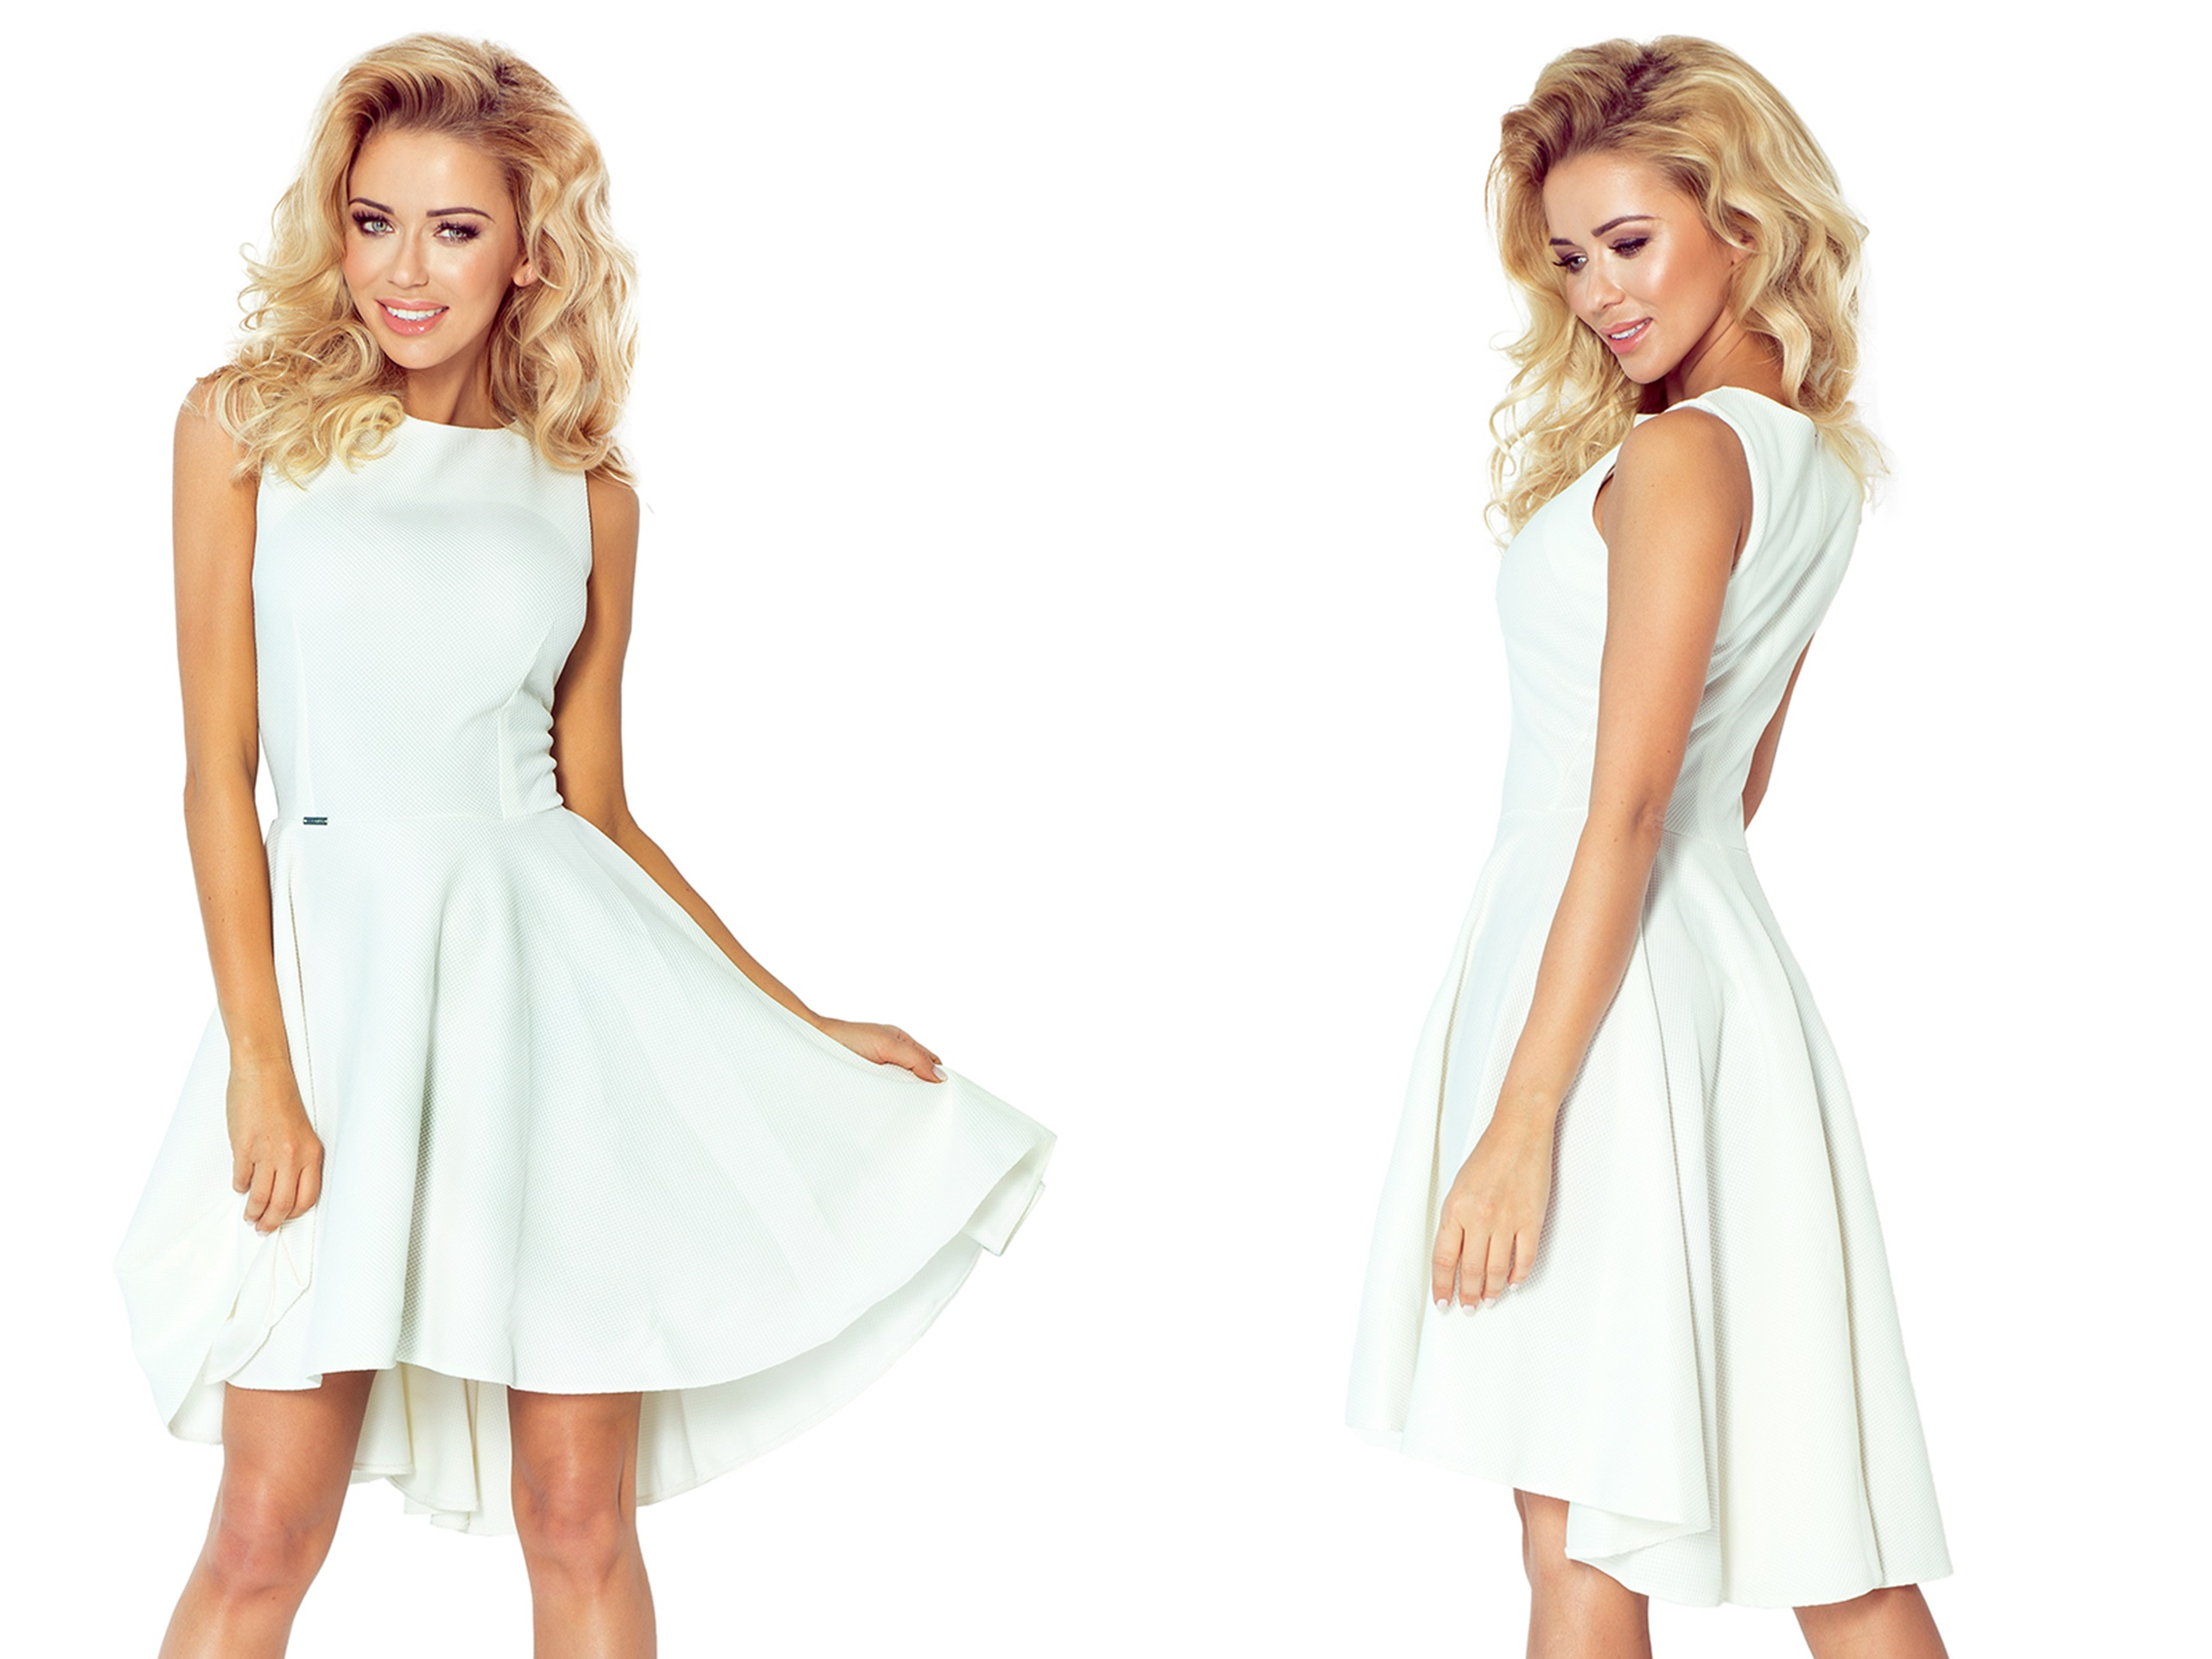 dac53aee65 ELEGANCKA Sukienka na SYLWESTRA KARNAWAŁ 66-7 XL - 7343586111 ...